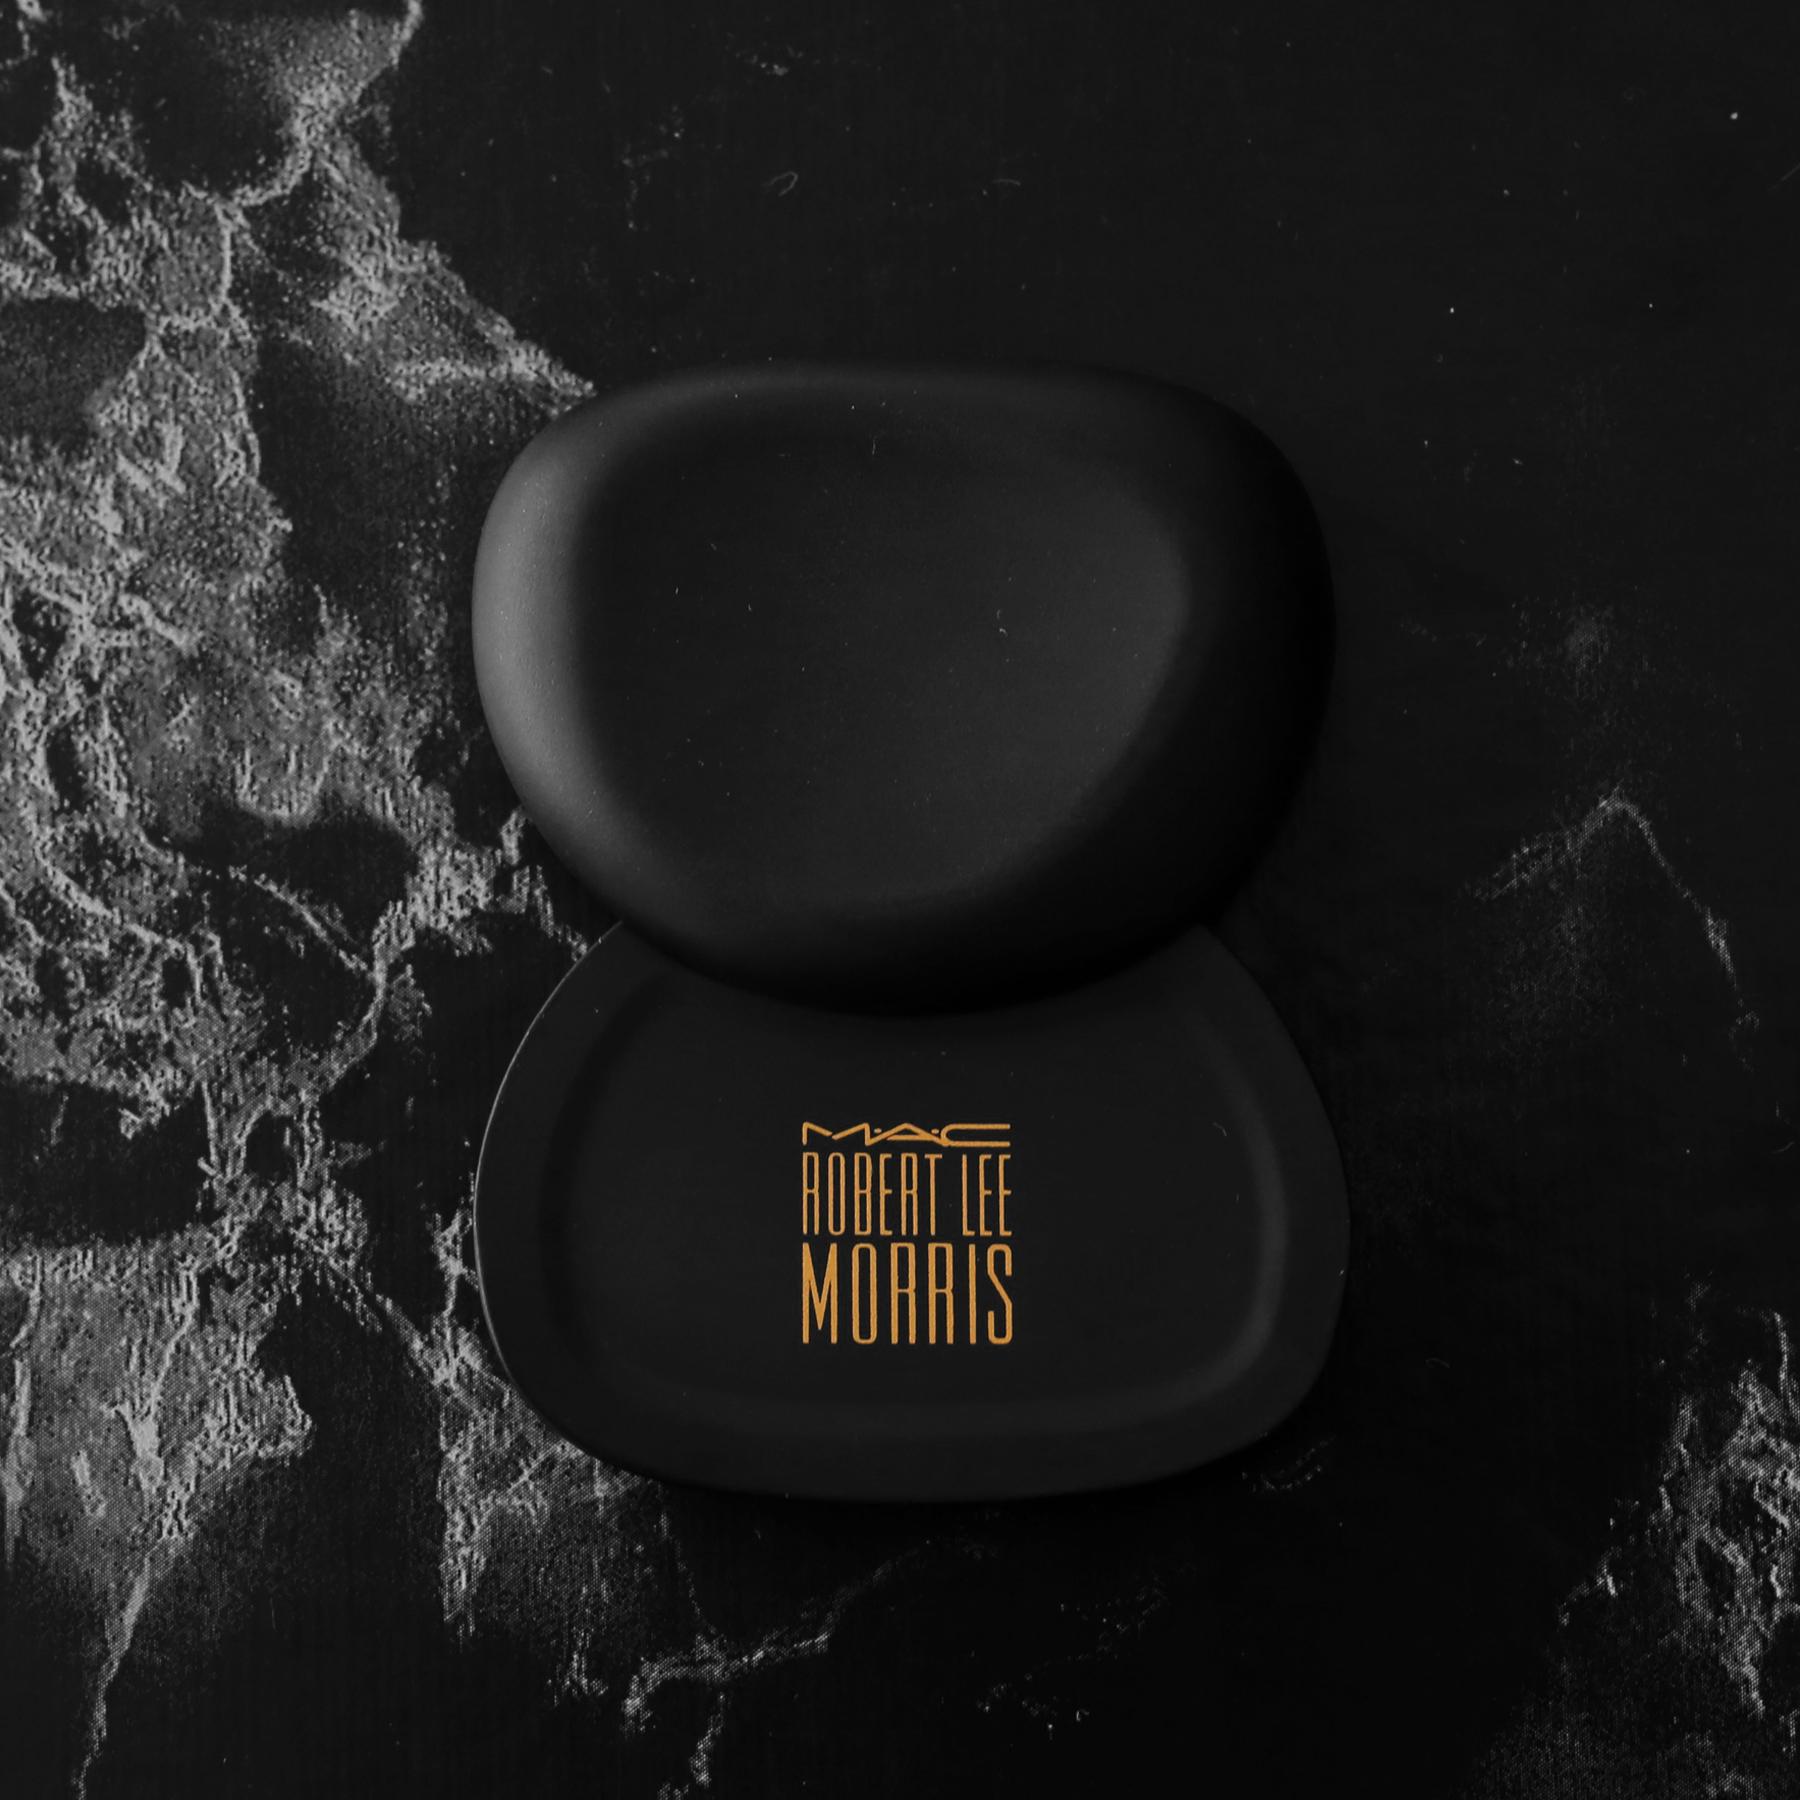 MAC x Robert Lee Morris makeup collection 2017 - limited edition pebble compact - beauty_5531.jpg